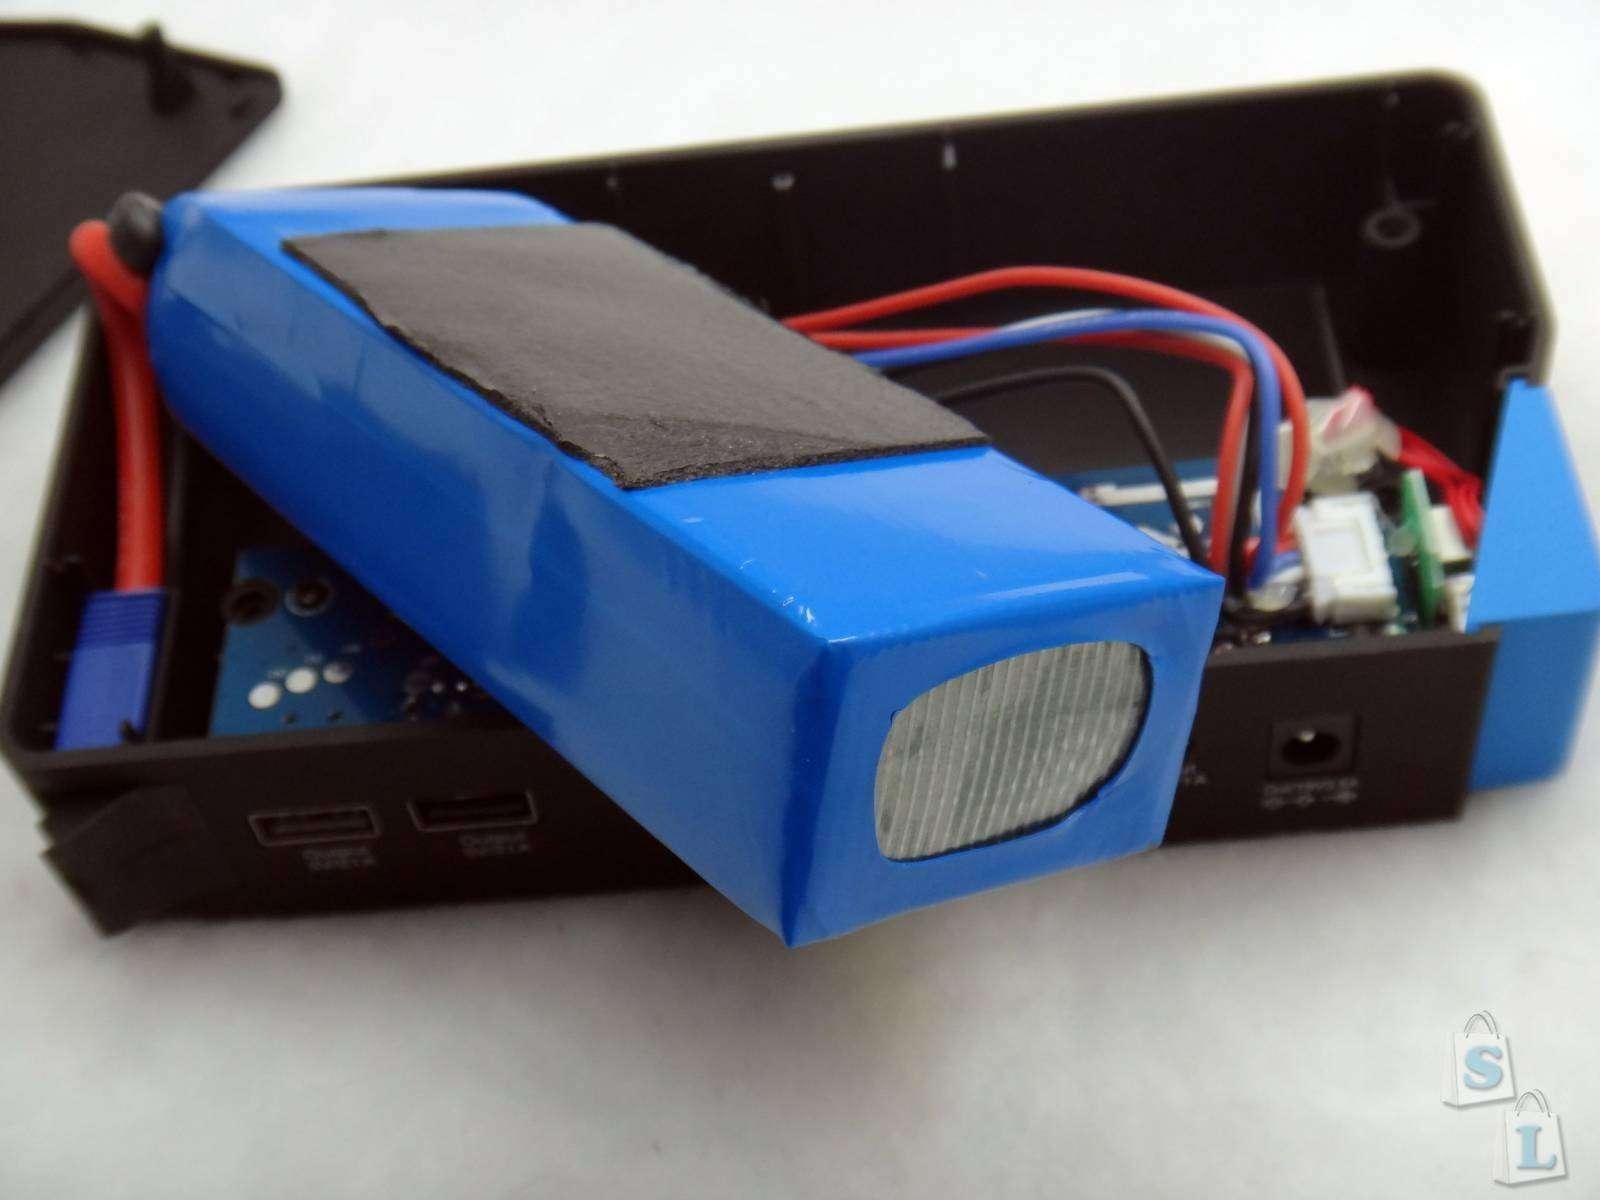 GearBest: JumpStarter для авто AnyPRO 15000 mAh 400А - powerbank для автомобиля